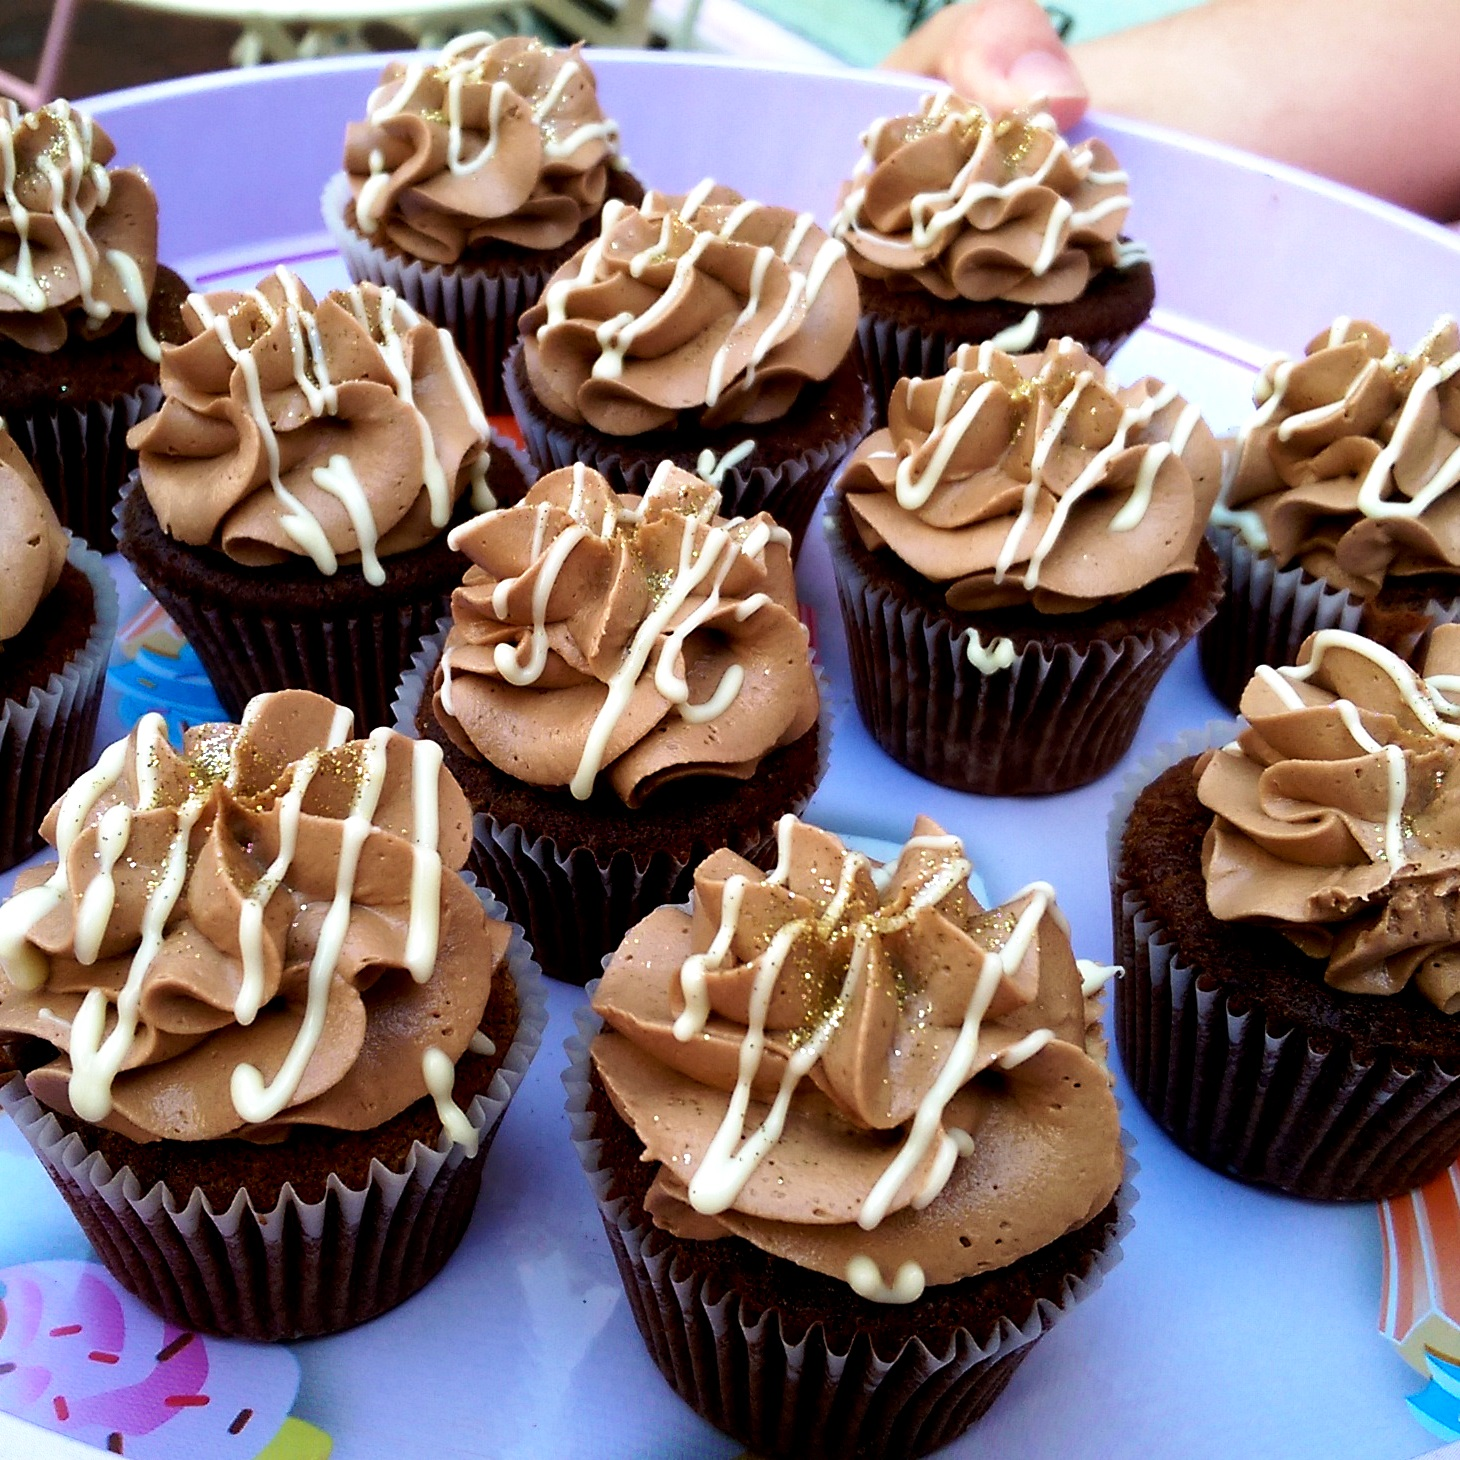 Brighton Chocolate Ecstasy Tour chocolate cupcakes